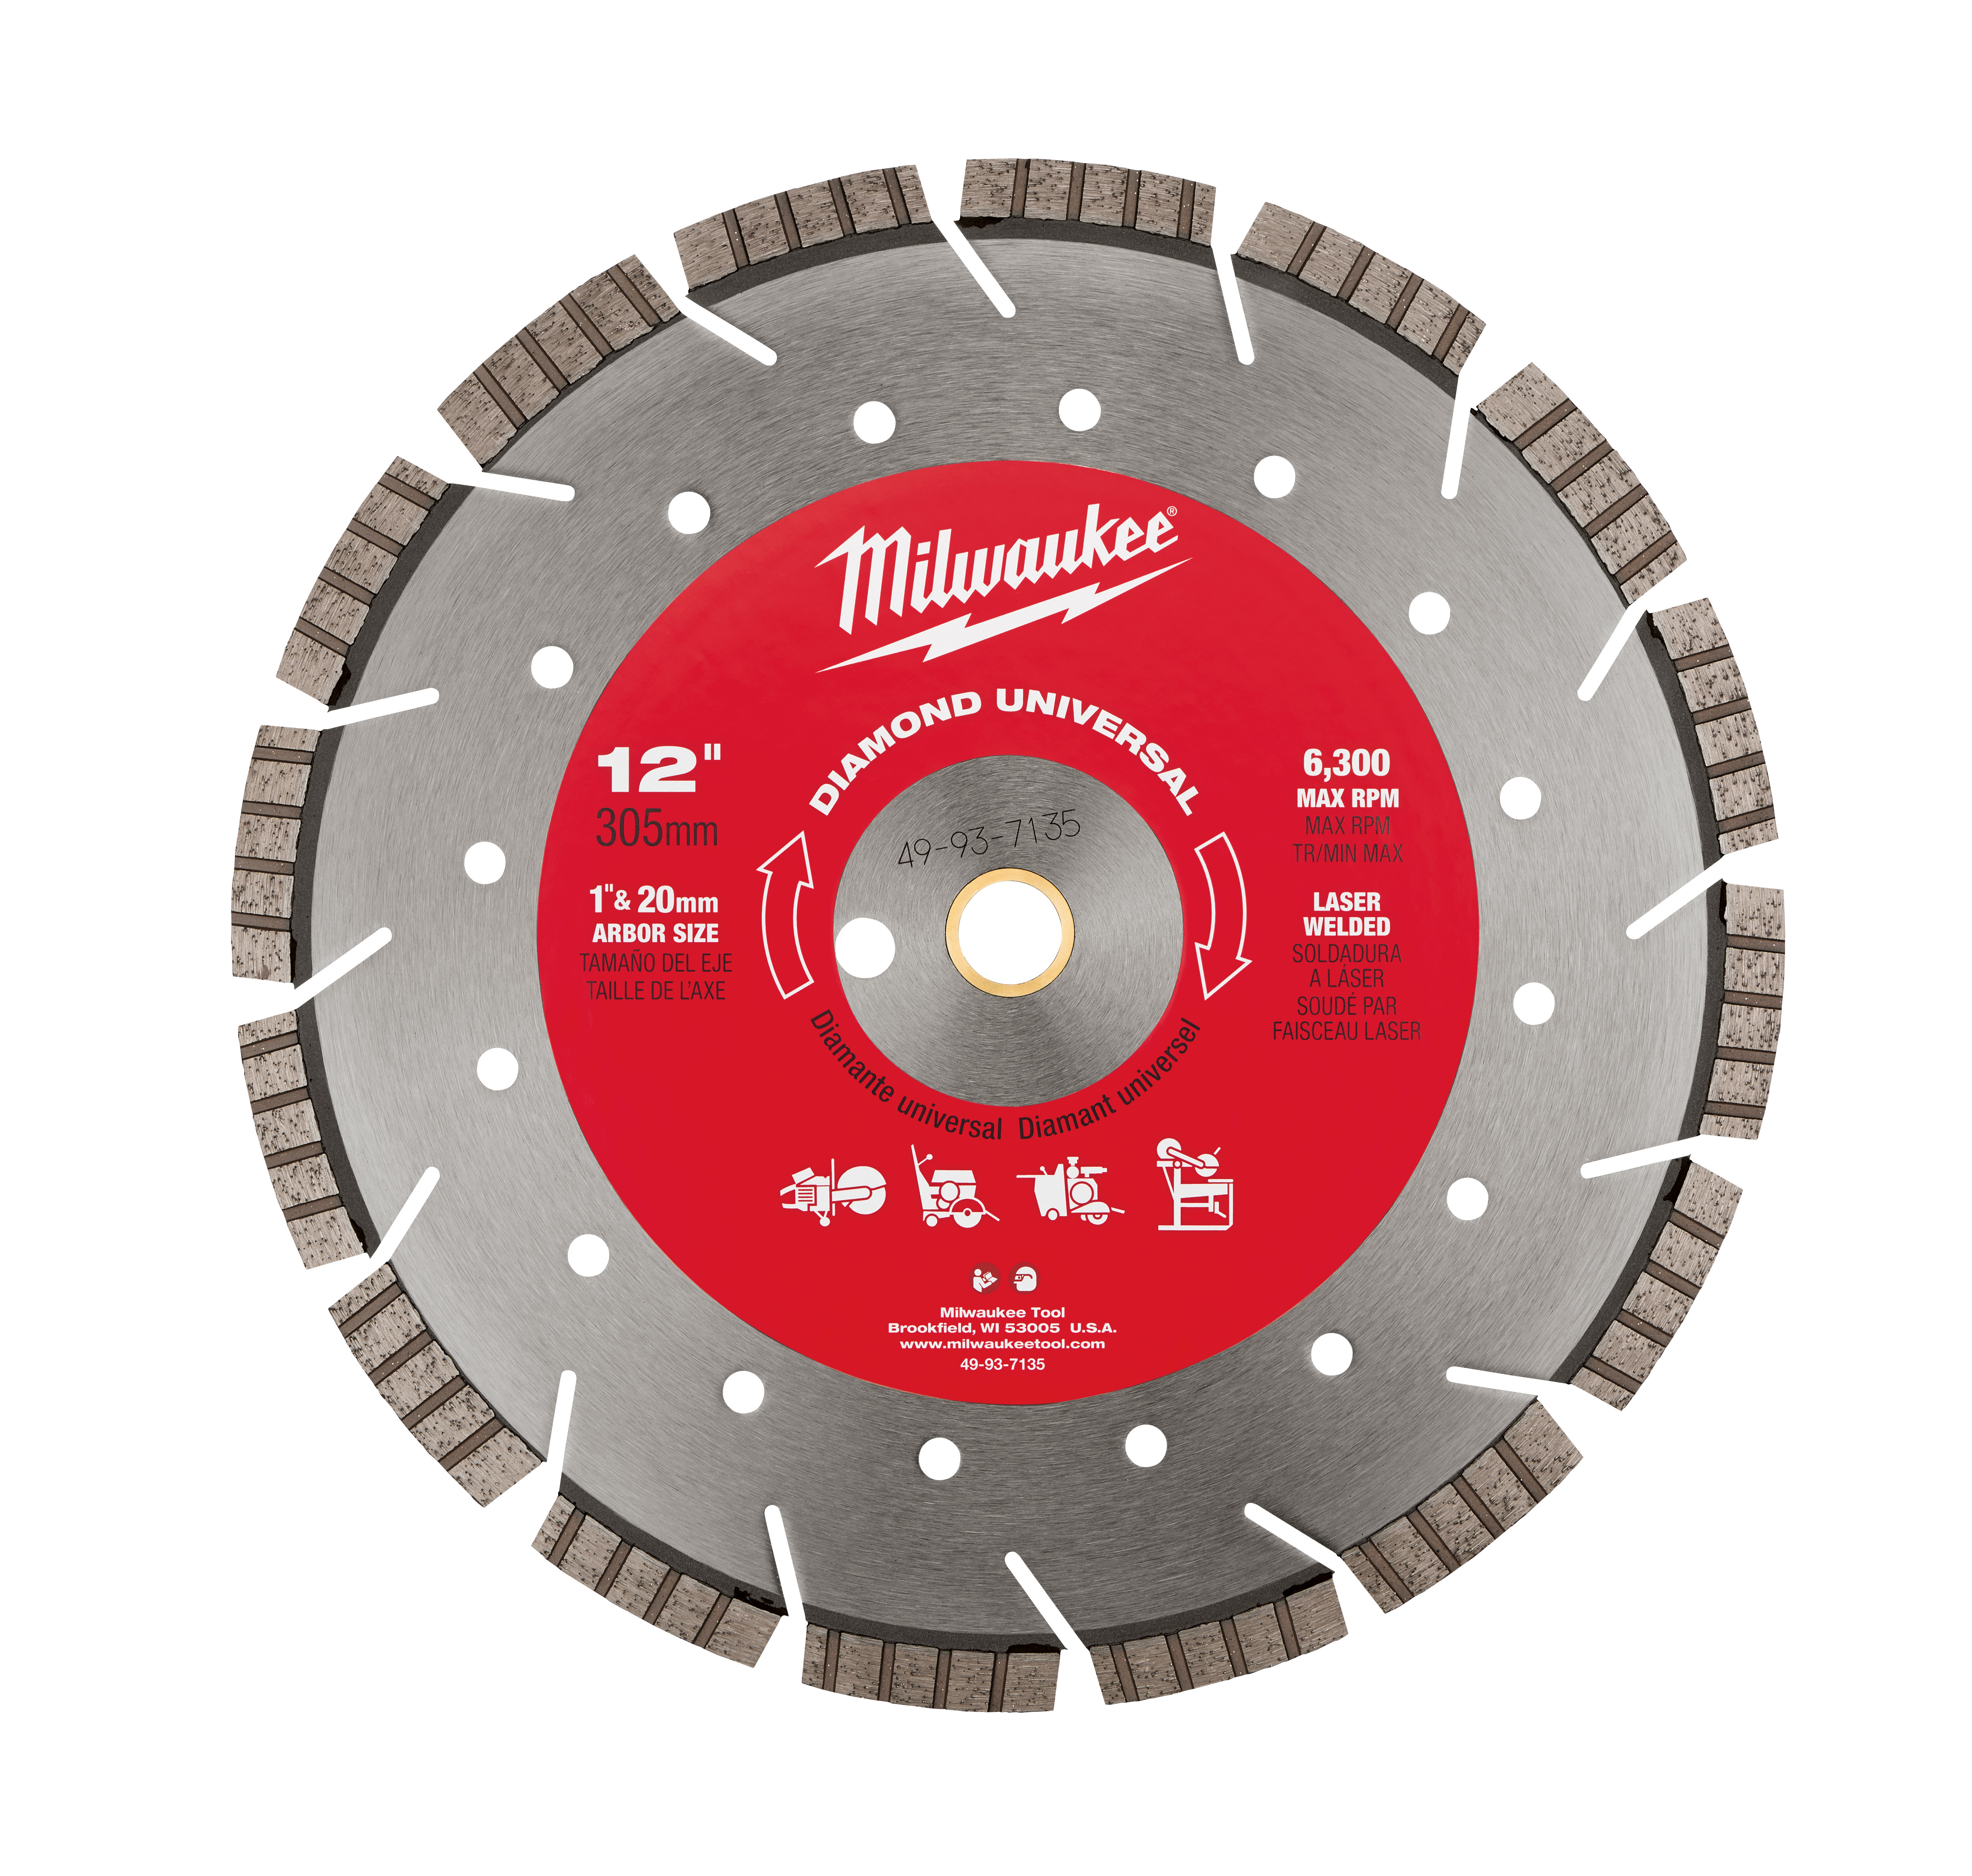 Milwaukee® 49-93-7135 Universal Segmented Turbo Circular Diamond Saw Blade, 12 in Dia Blade, 1 in, 20 mm Arbor/Shank, Dry/Wet Cutting